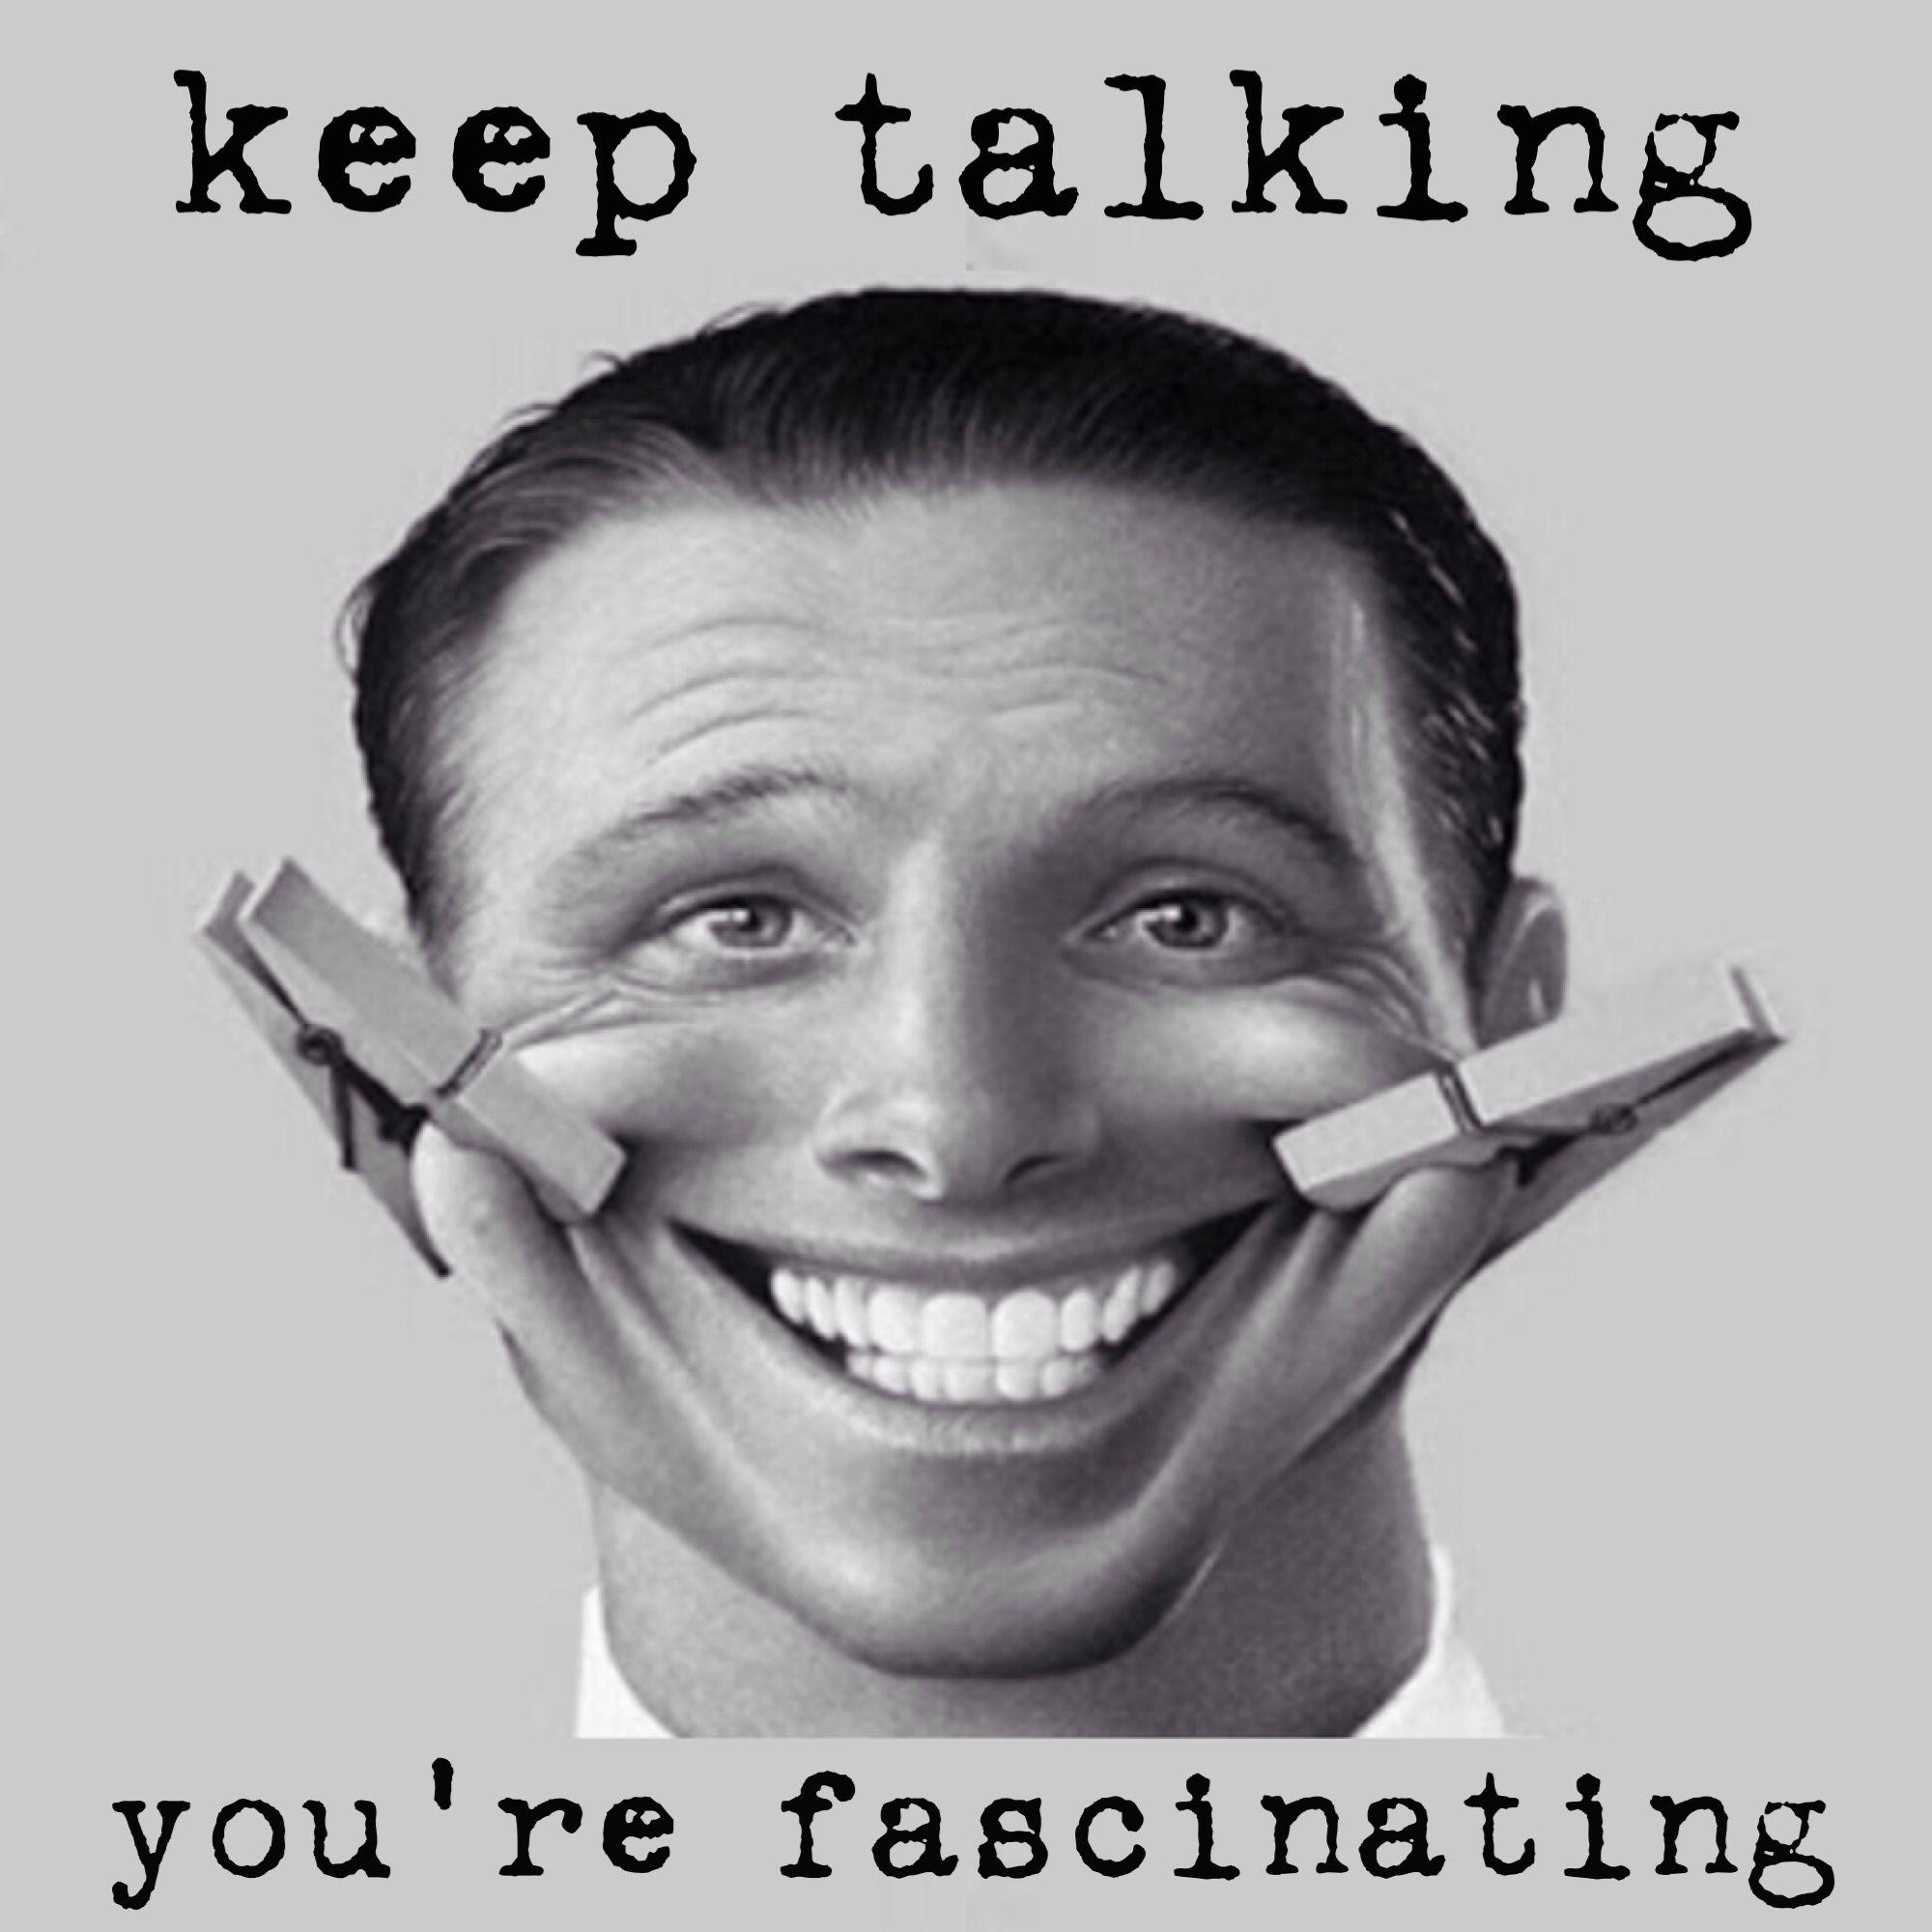 Keep talking, you're fascinating 👁💥💣